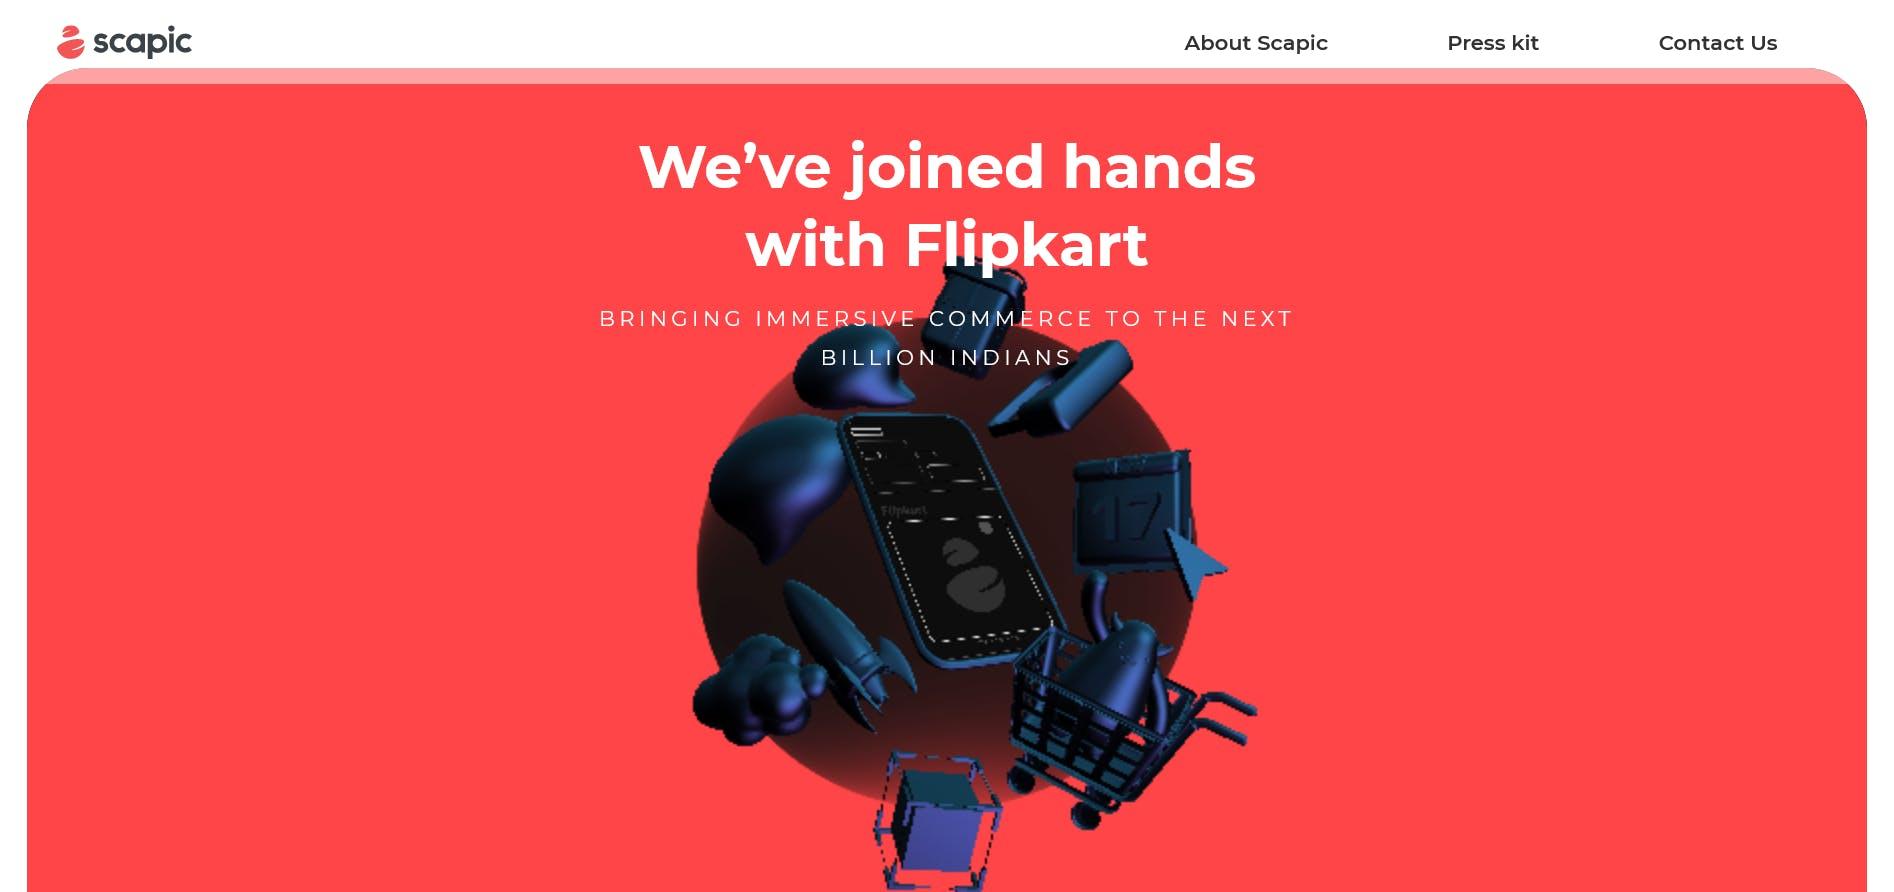 Screenshot 2021-05-07 at 10-41-21 We've joined hands with Flipkart.png